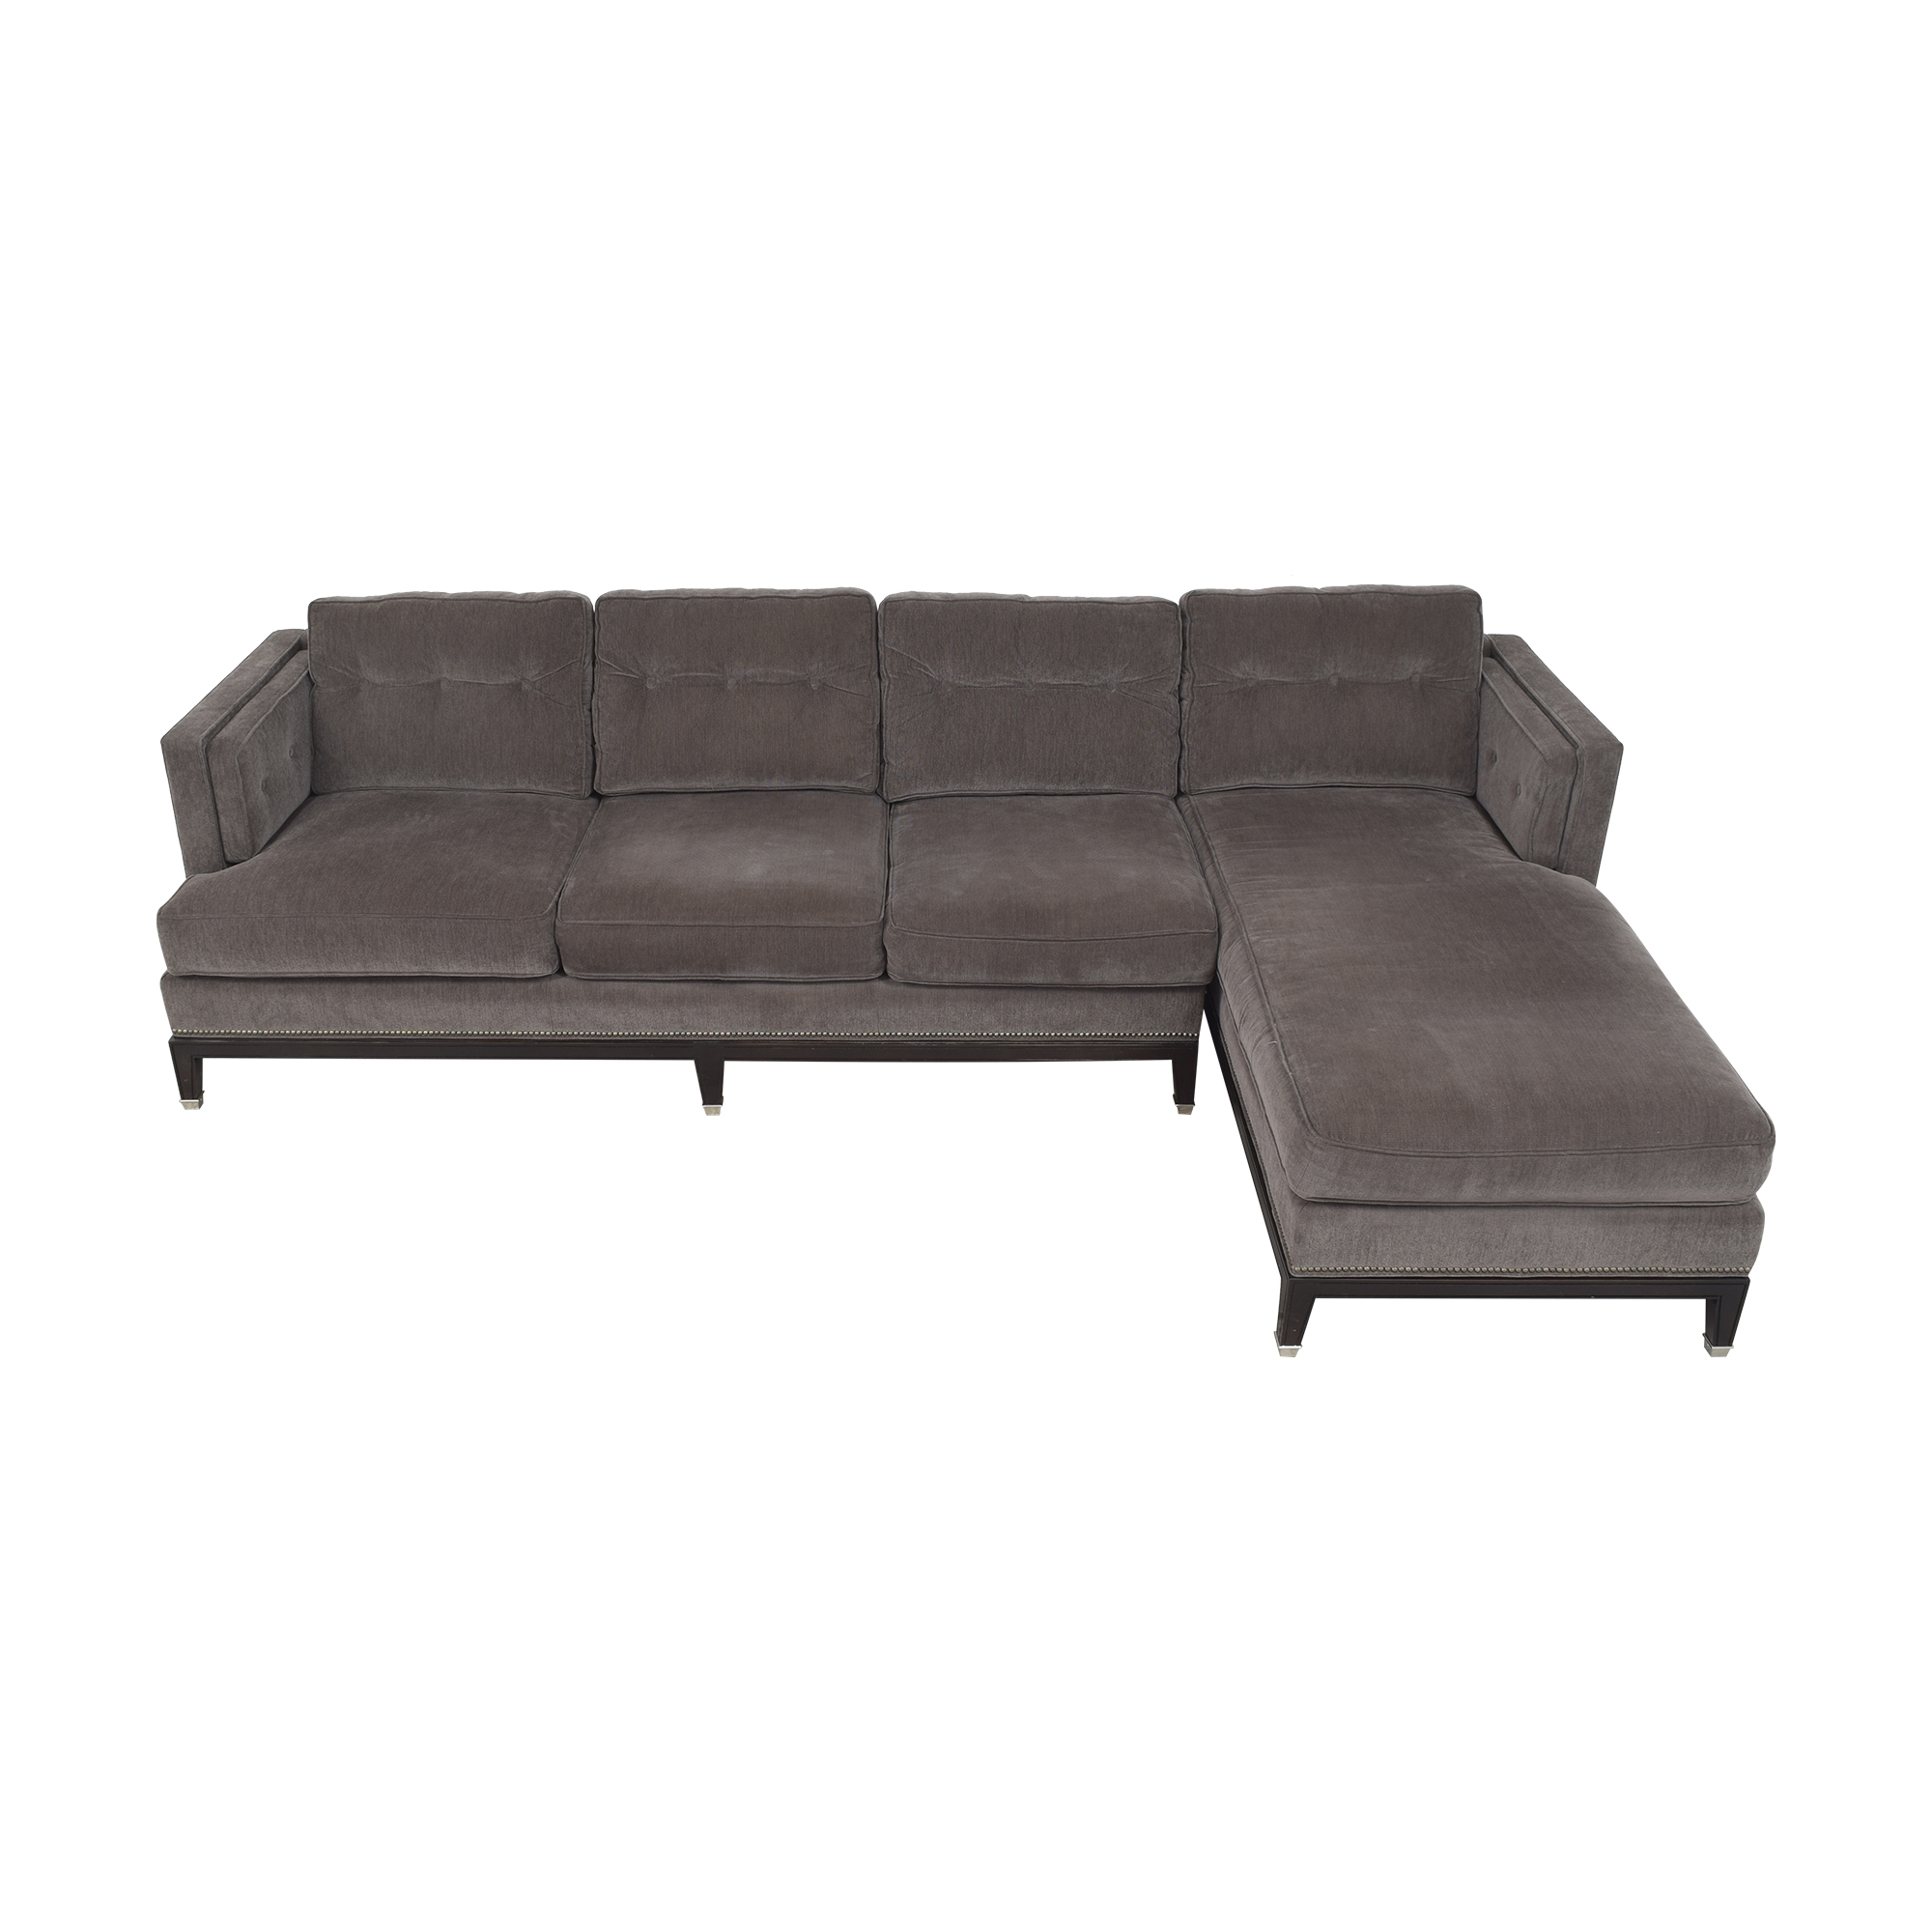 Vanguard Furniture Vanguard Furniture Michael Weiss Whitaker Sectional Sofa on sale